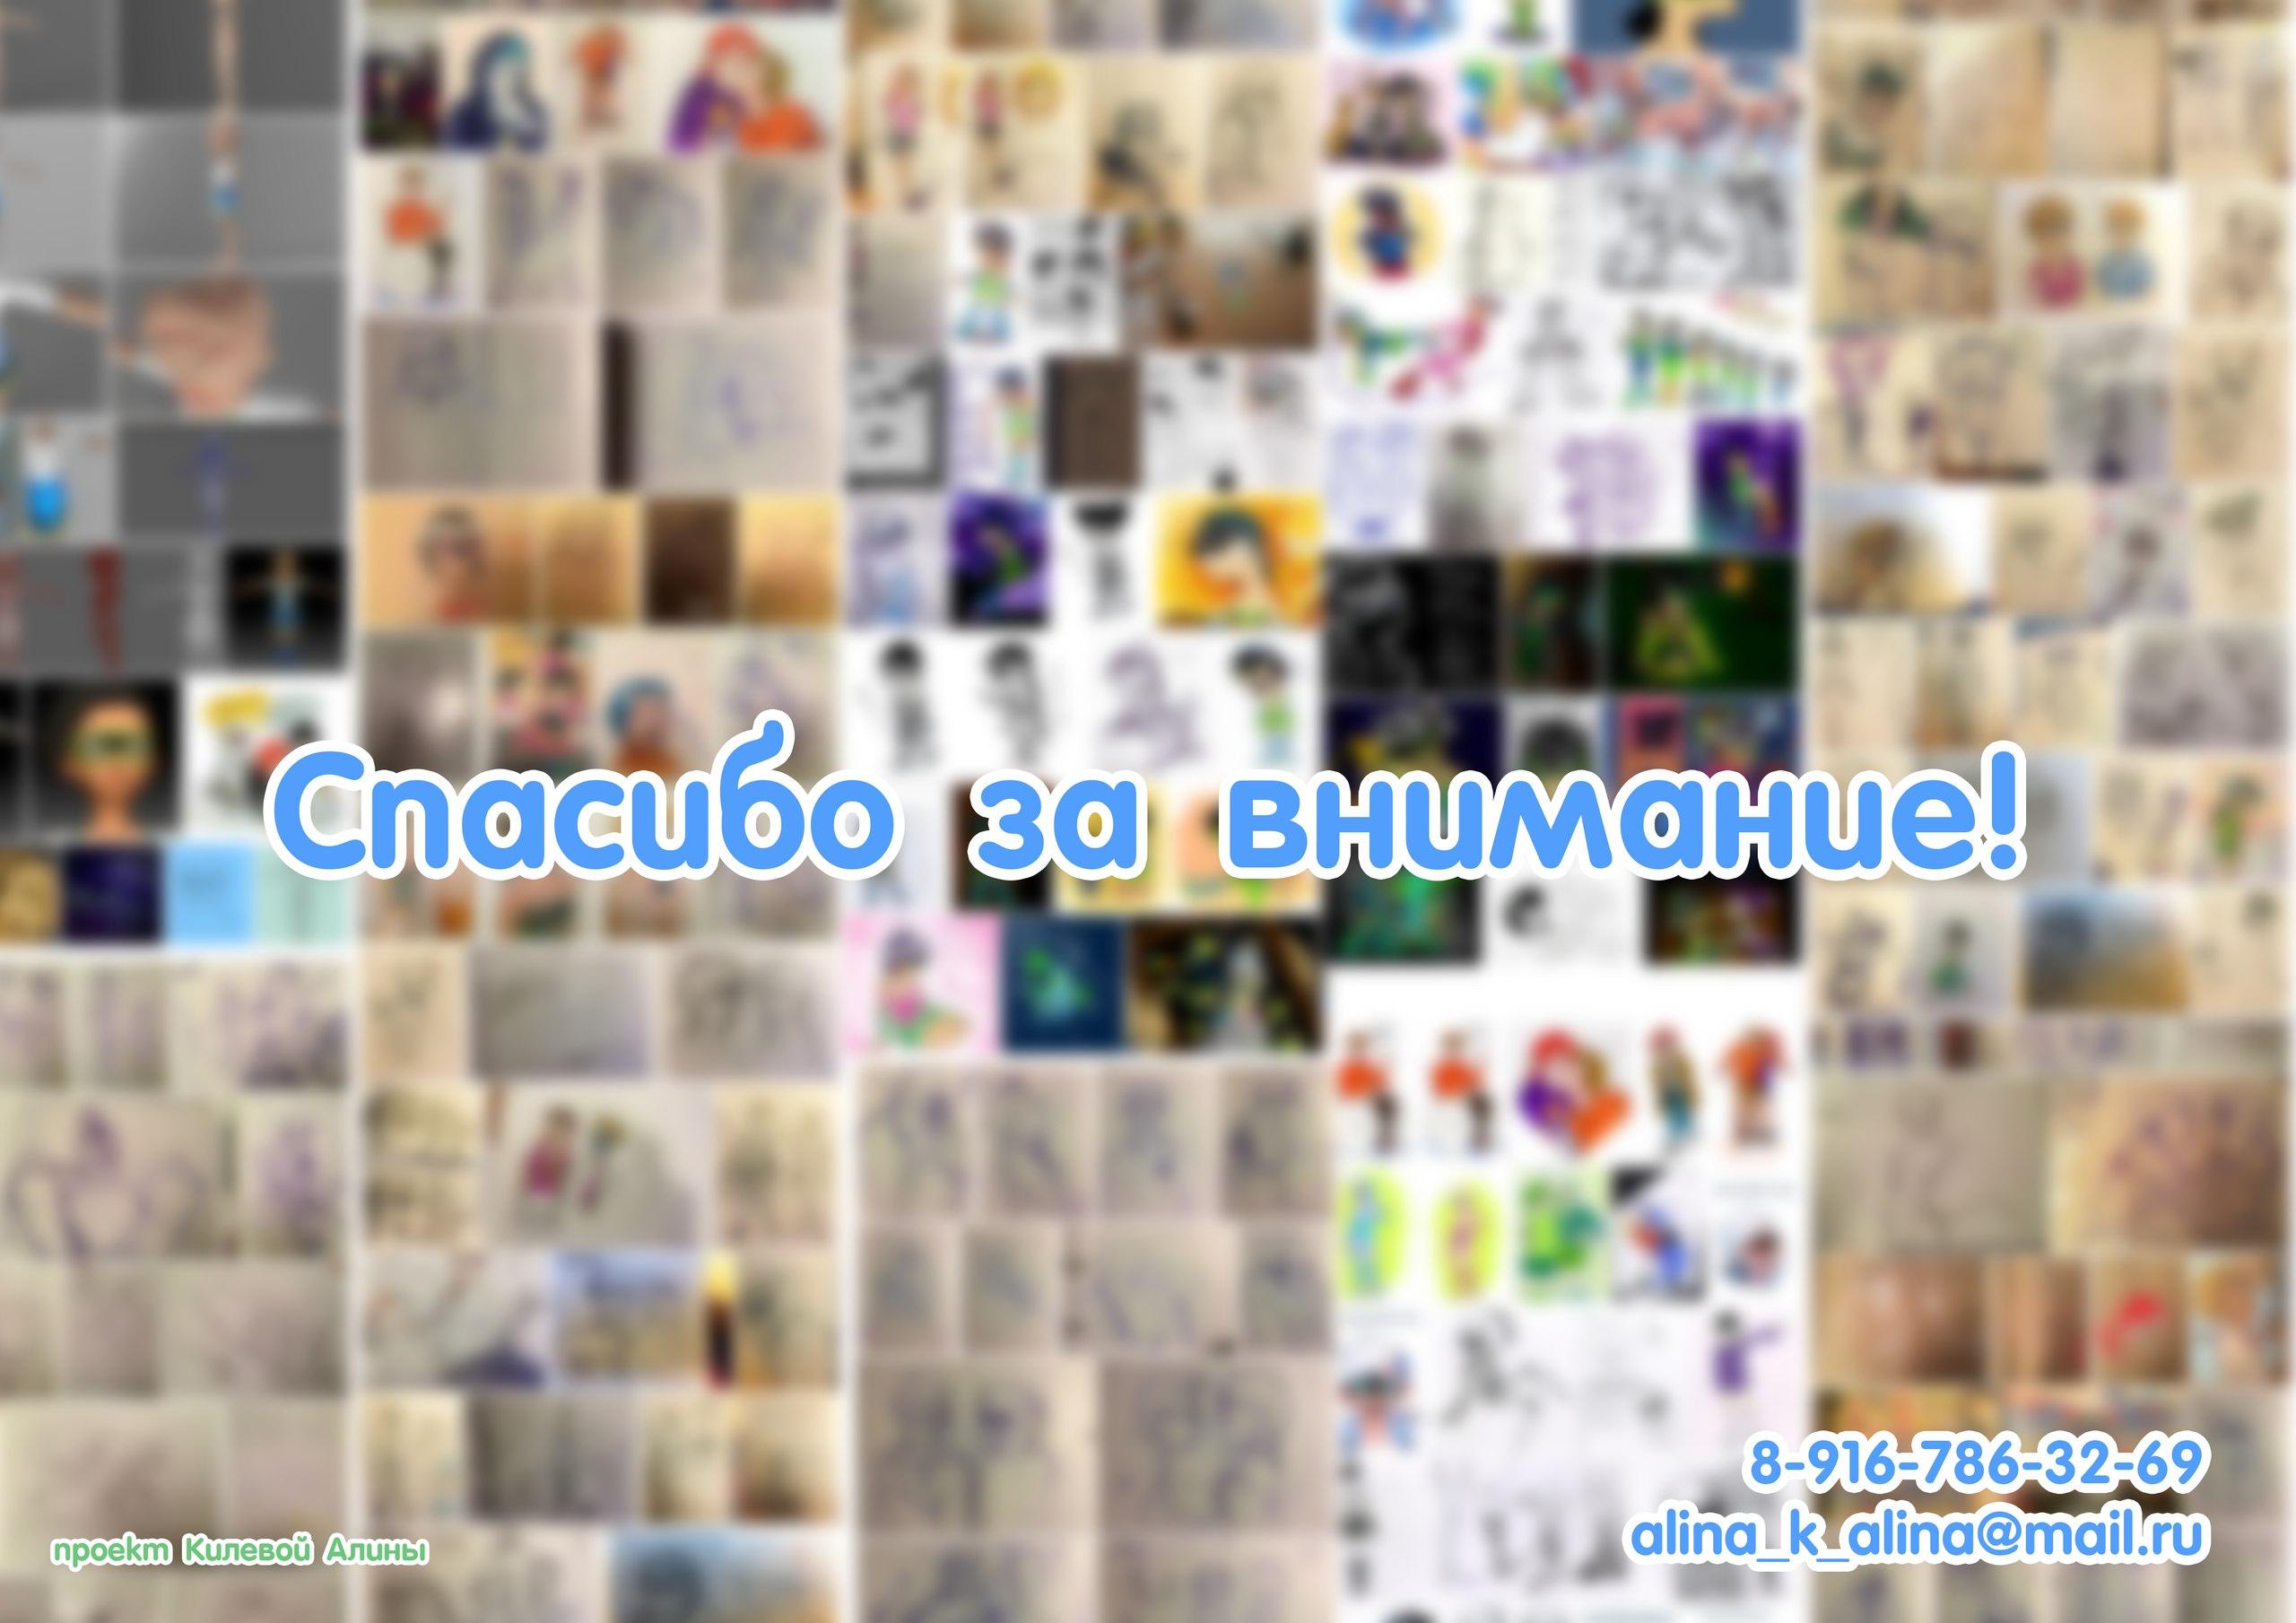 https://pp.userapi.com/c623900/v623900670/3e467/1NBWT7BegrM.jpg